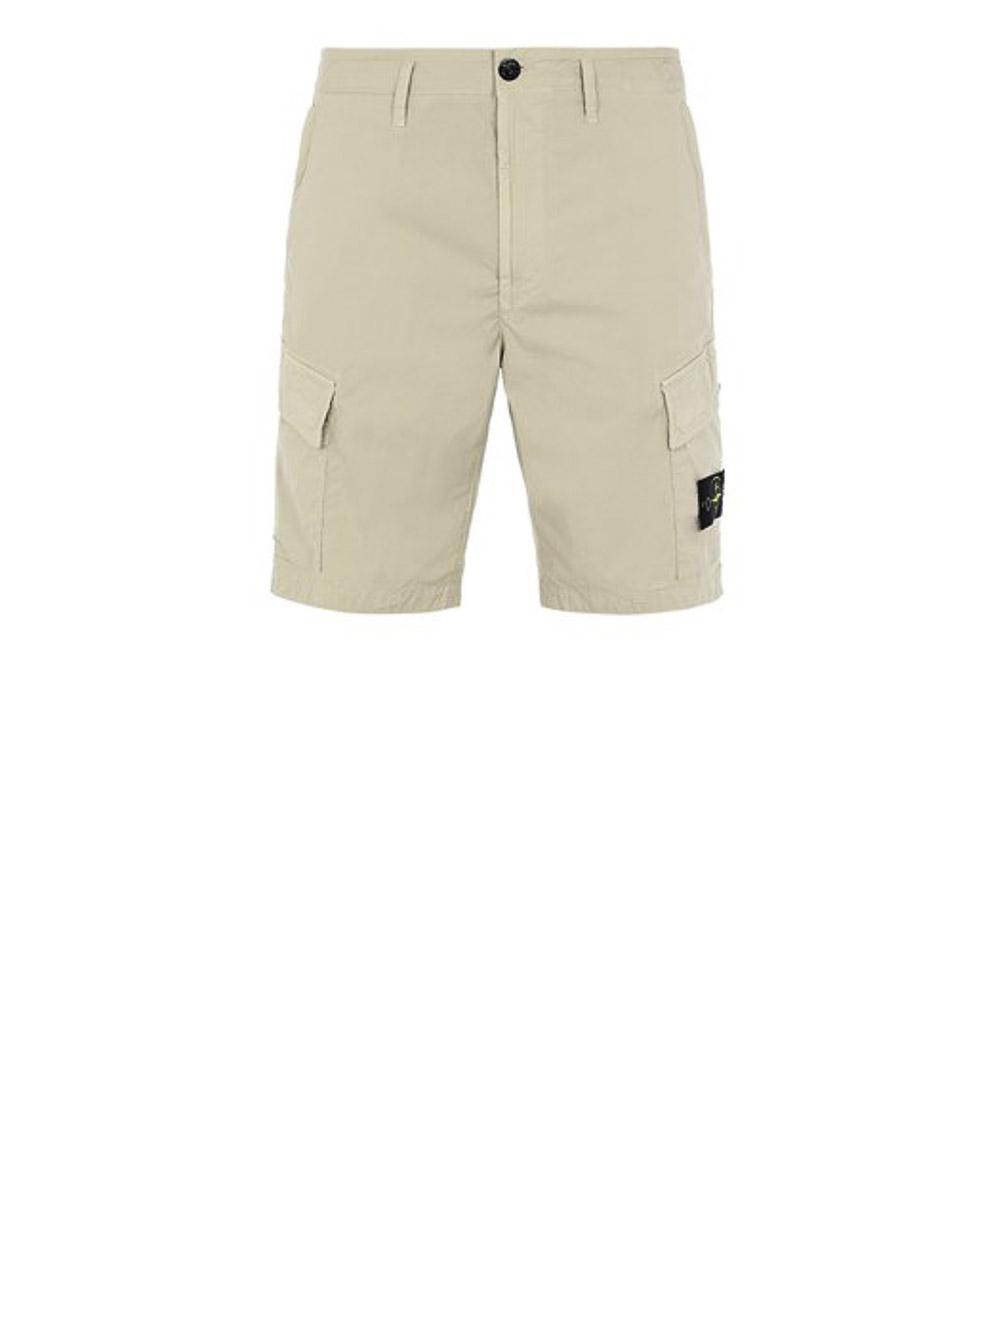 STONE ISLAND Βερμούδα με πλαινές τσέπες MO7415L0803-V0095 ΚΑΦΕ